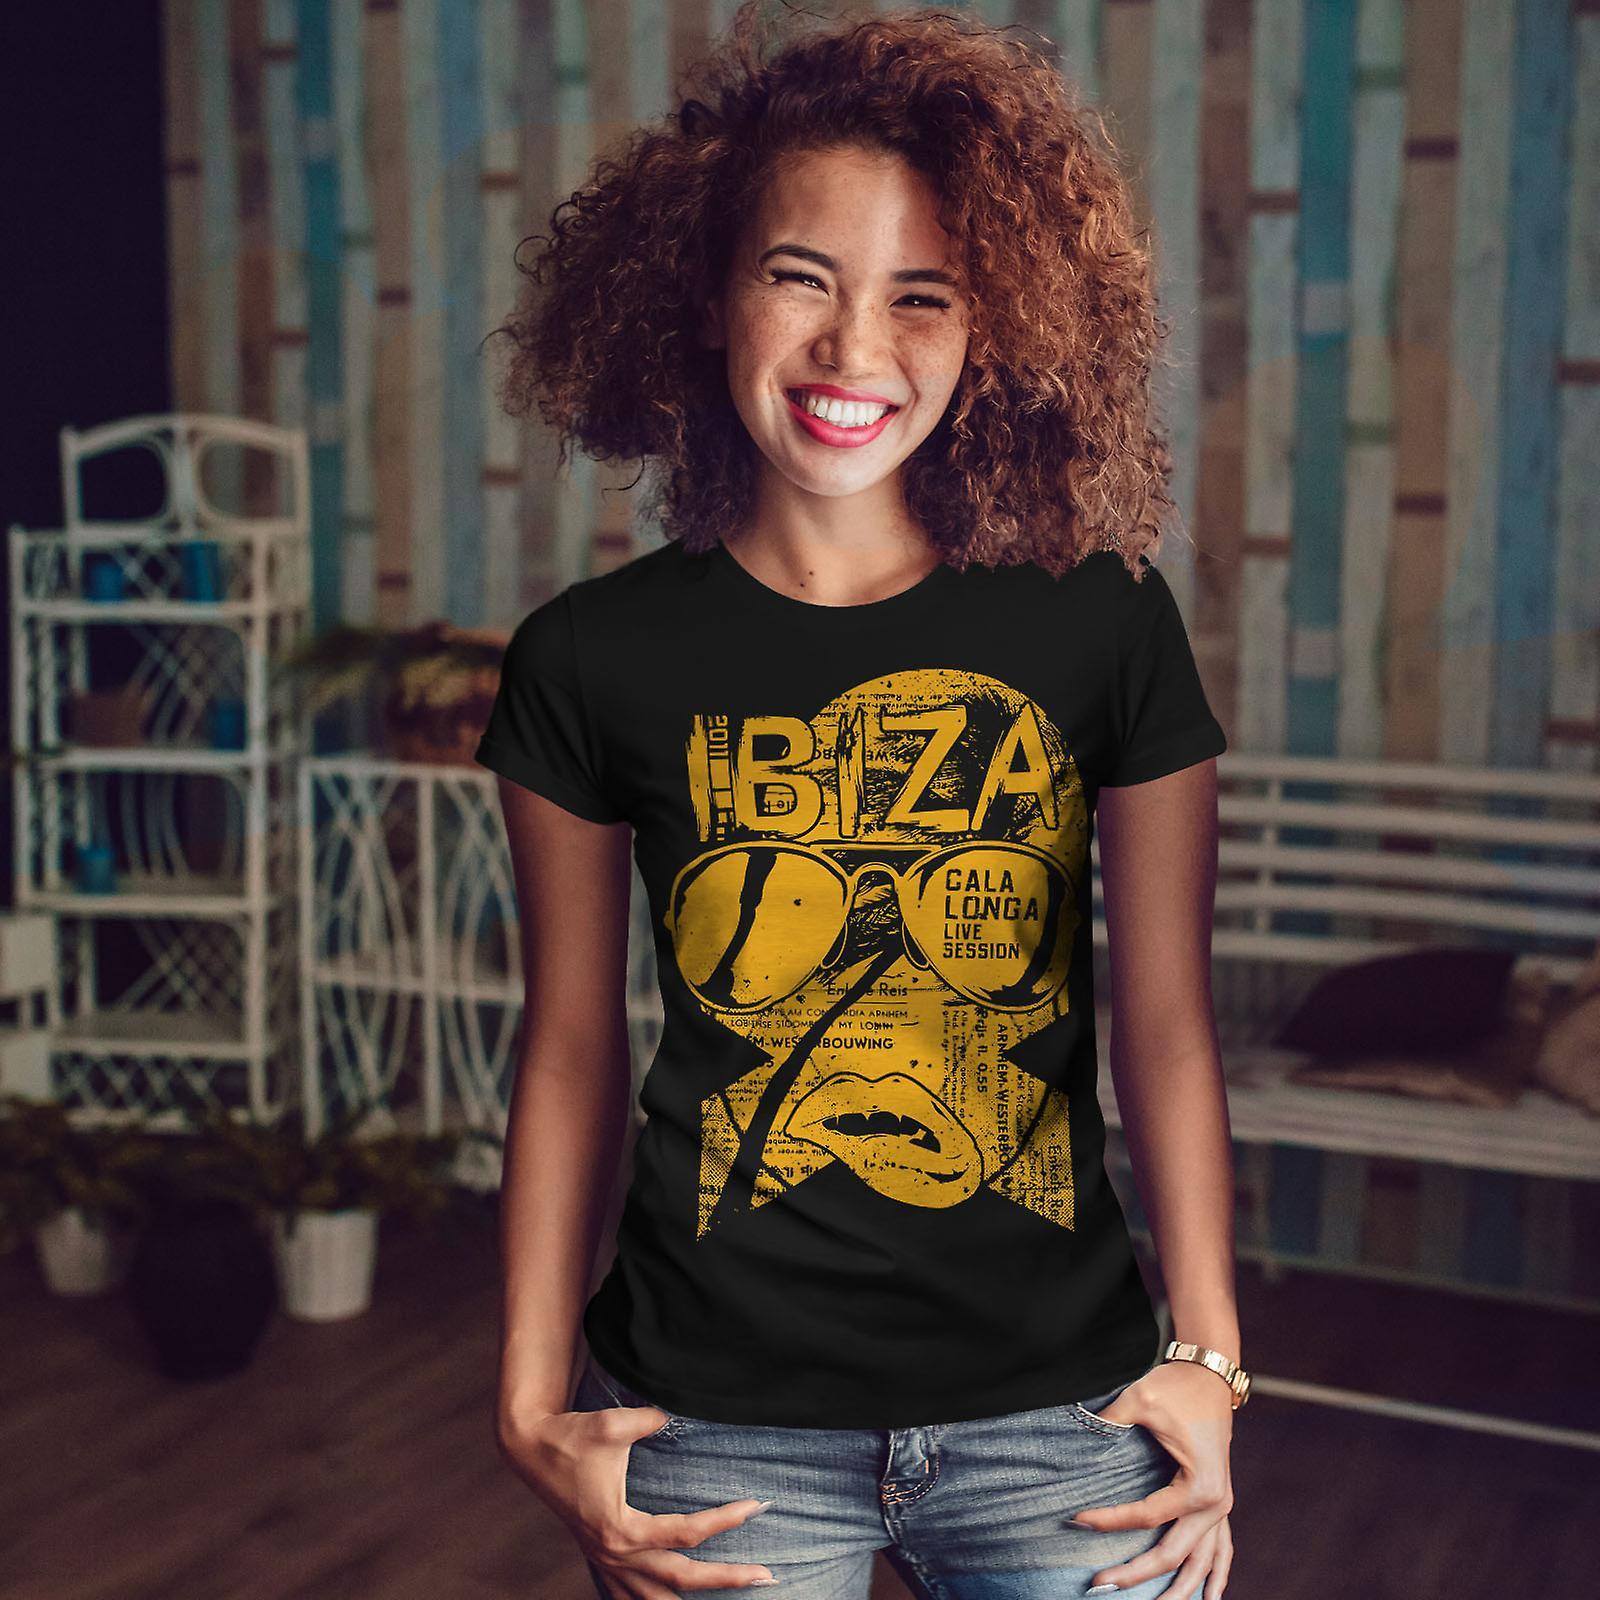 Ibiza Party Live BlackT-chemise femme | Wellcoda